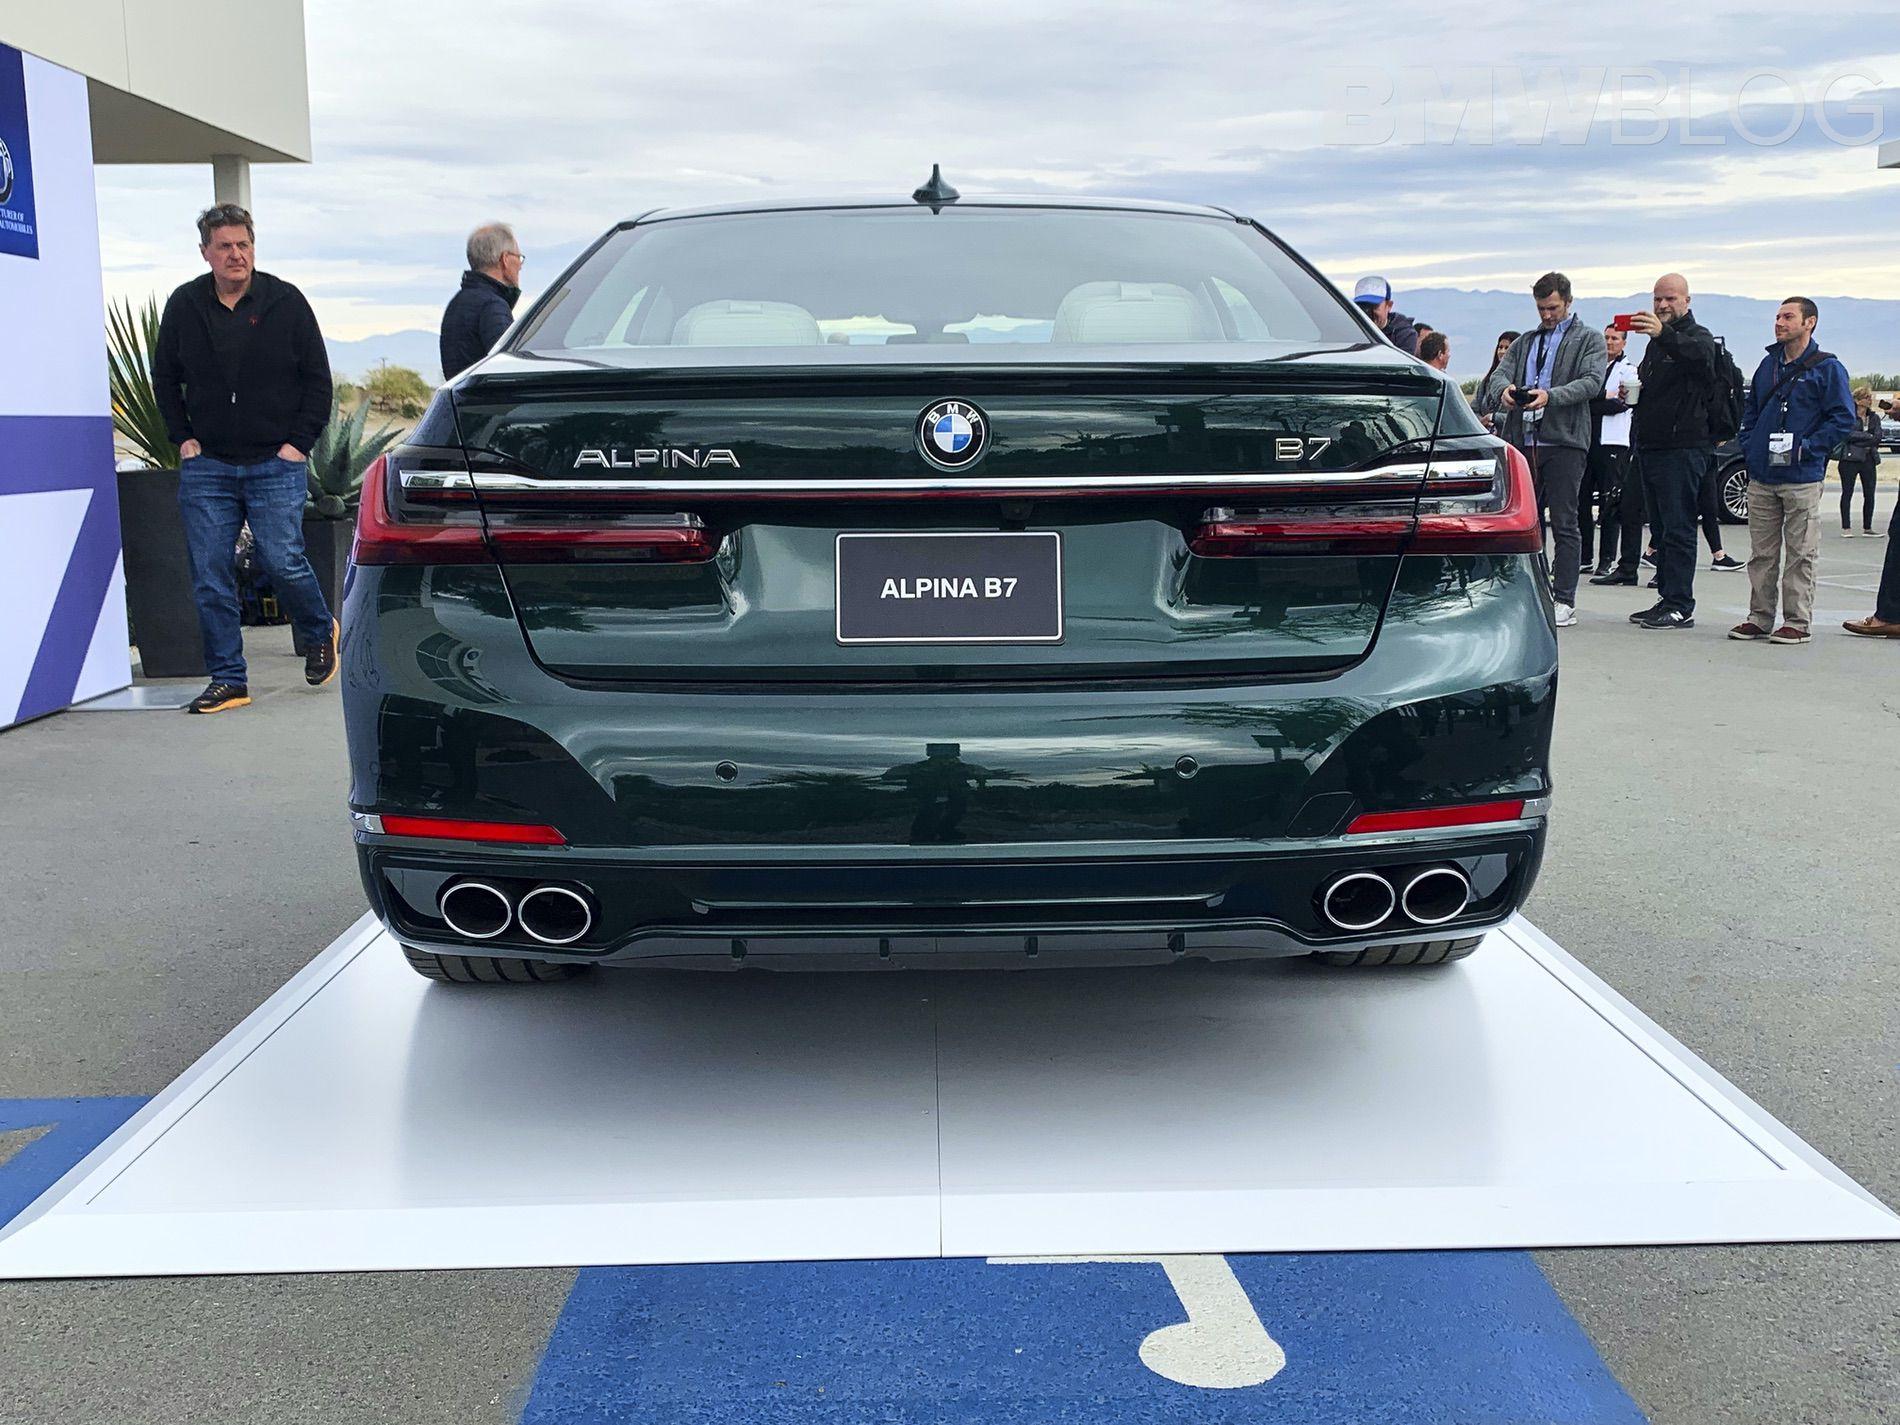 2019 - [BMW] Série 7 restylée  - Page 12 2020-ALPINA-B7-Facelift-22